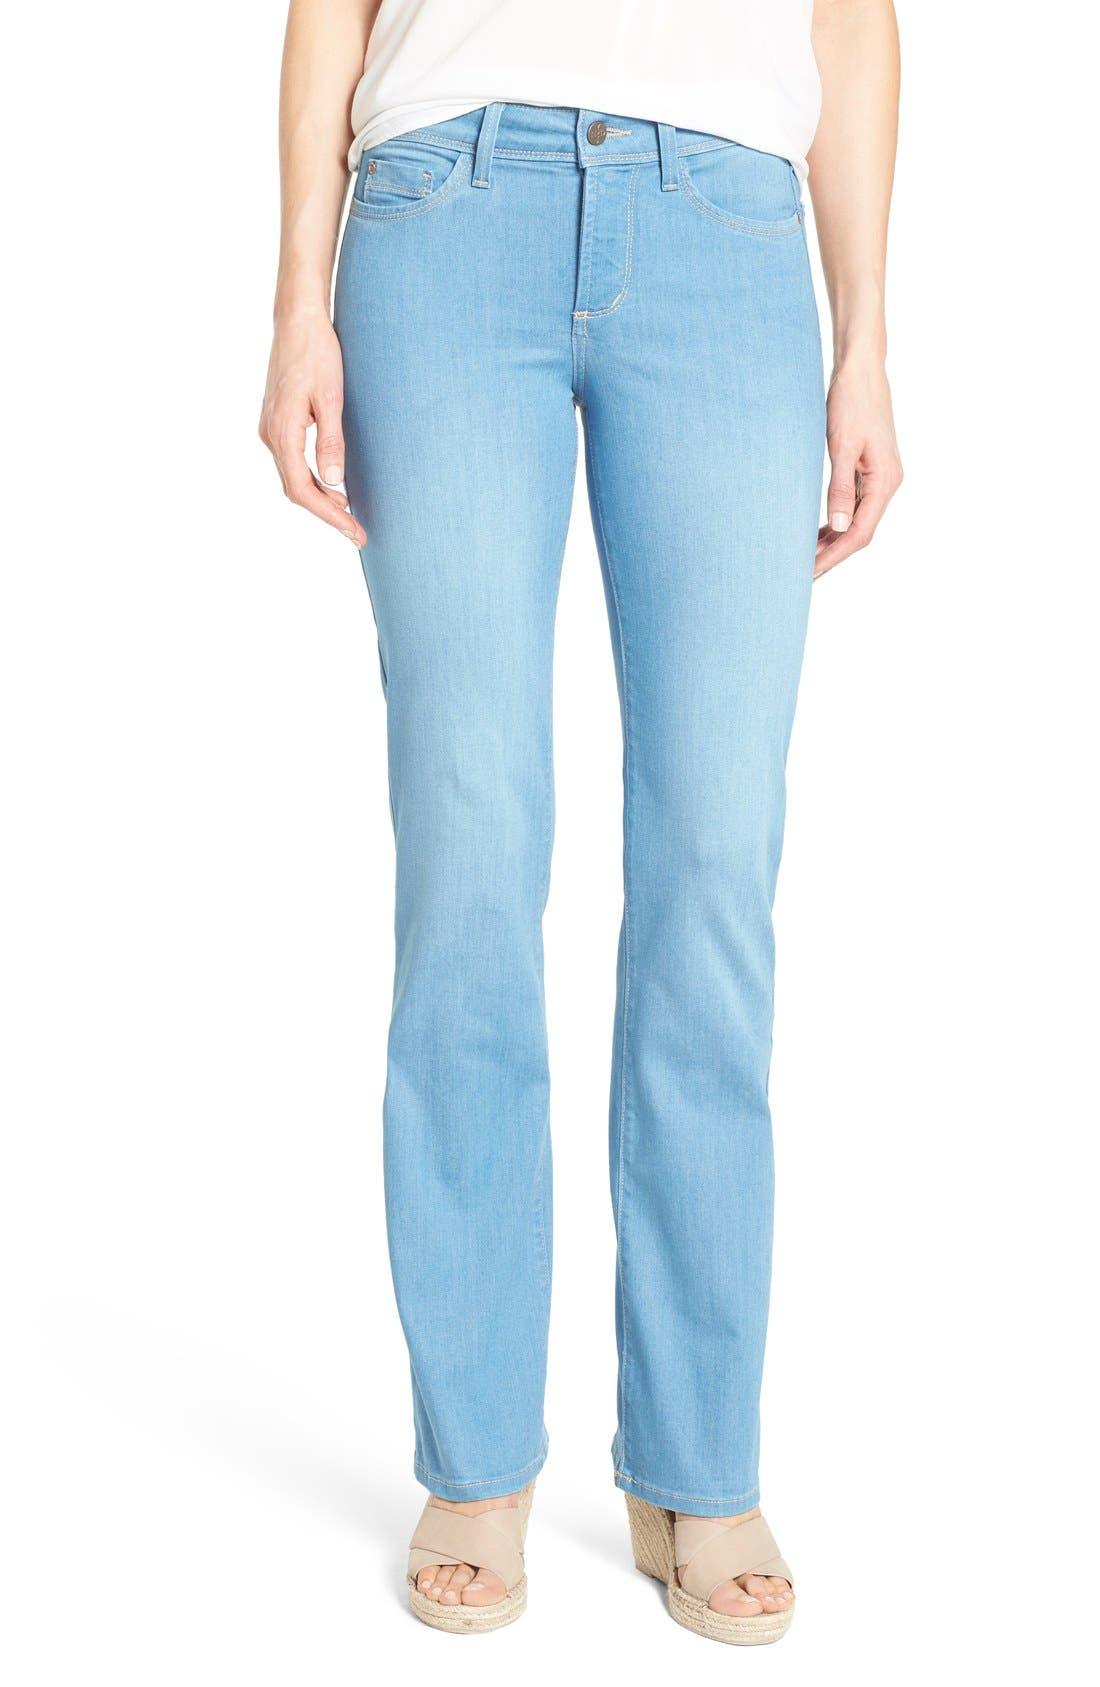 Alternate Image 1 Selected - NYDJ 'Barbara' Stretch Bootcut Jeans (Palm Bay)